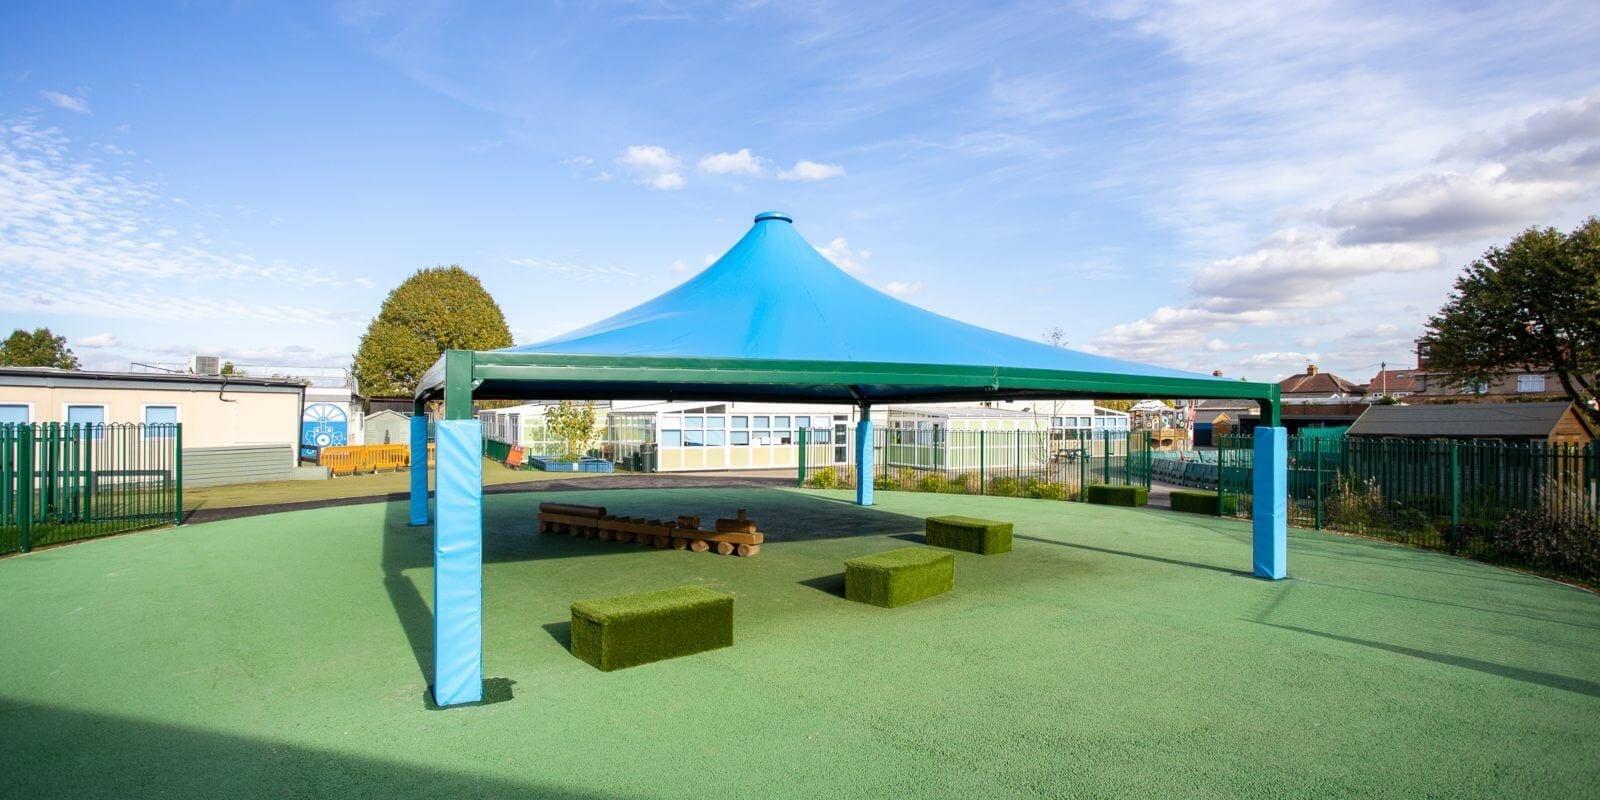 Fabric tepee canopy we designed for Hedgewood School